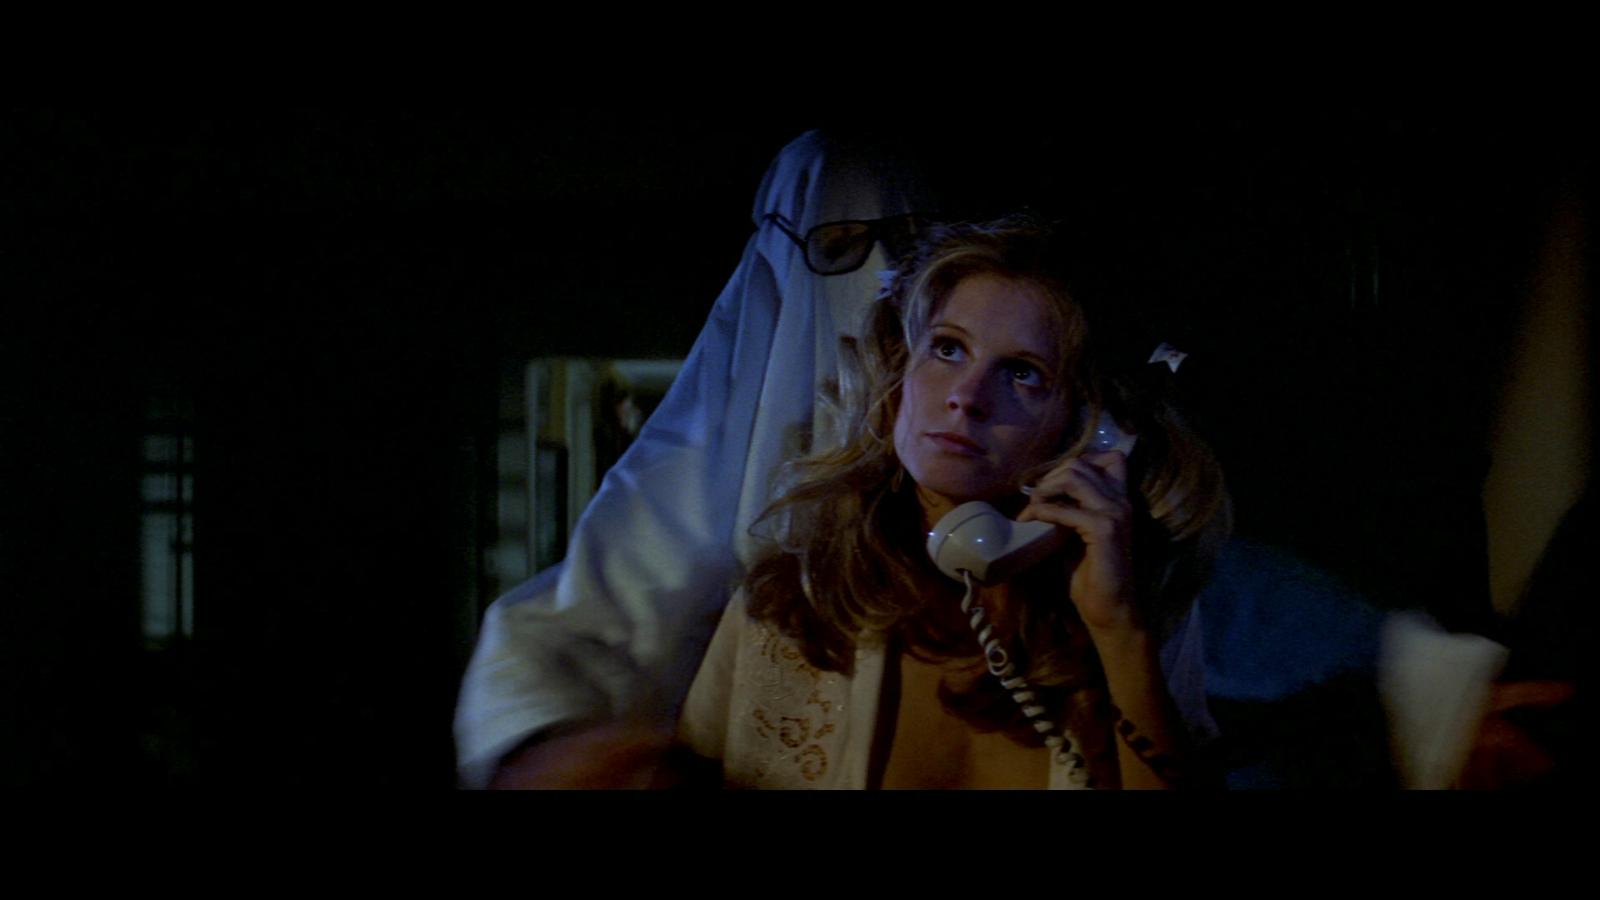 Brian Vs. Movies: Halloween (1978)